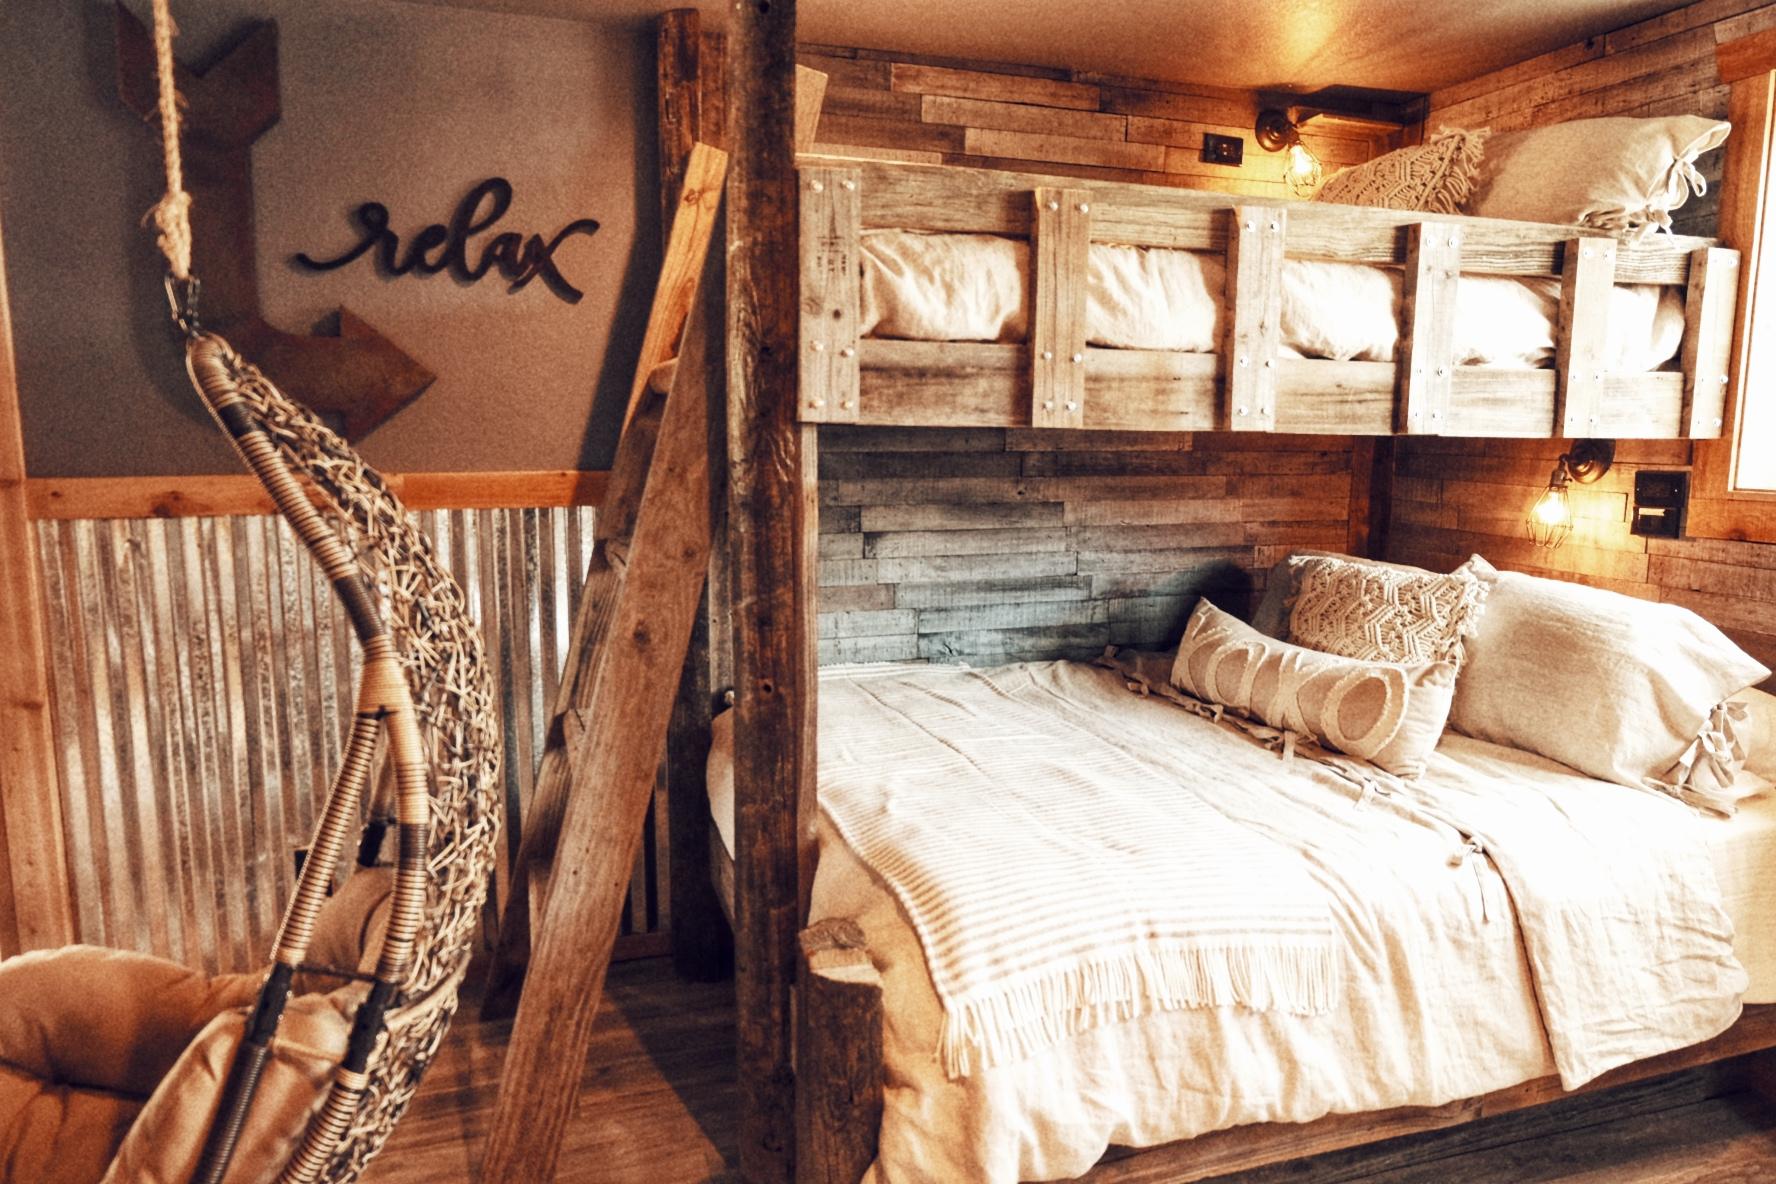 bunk beds in glowing embers b&b